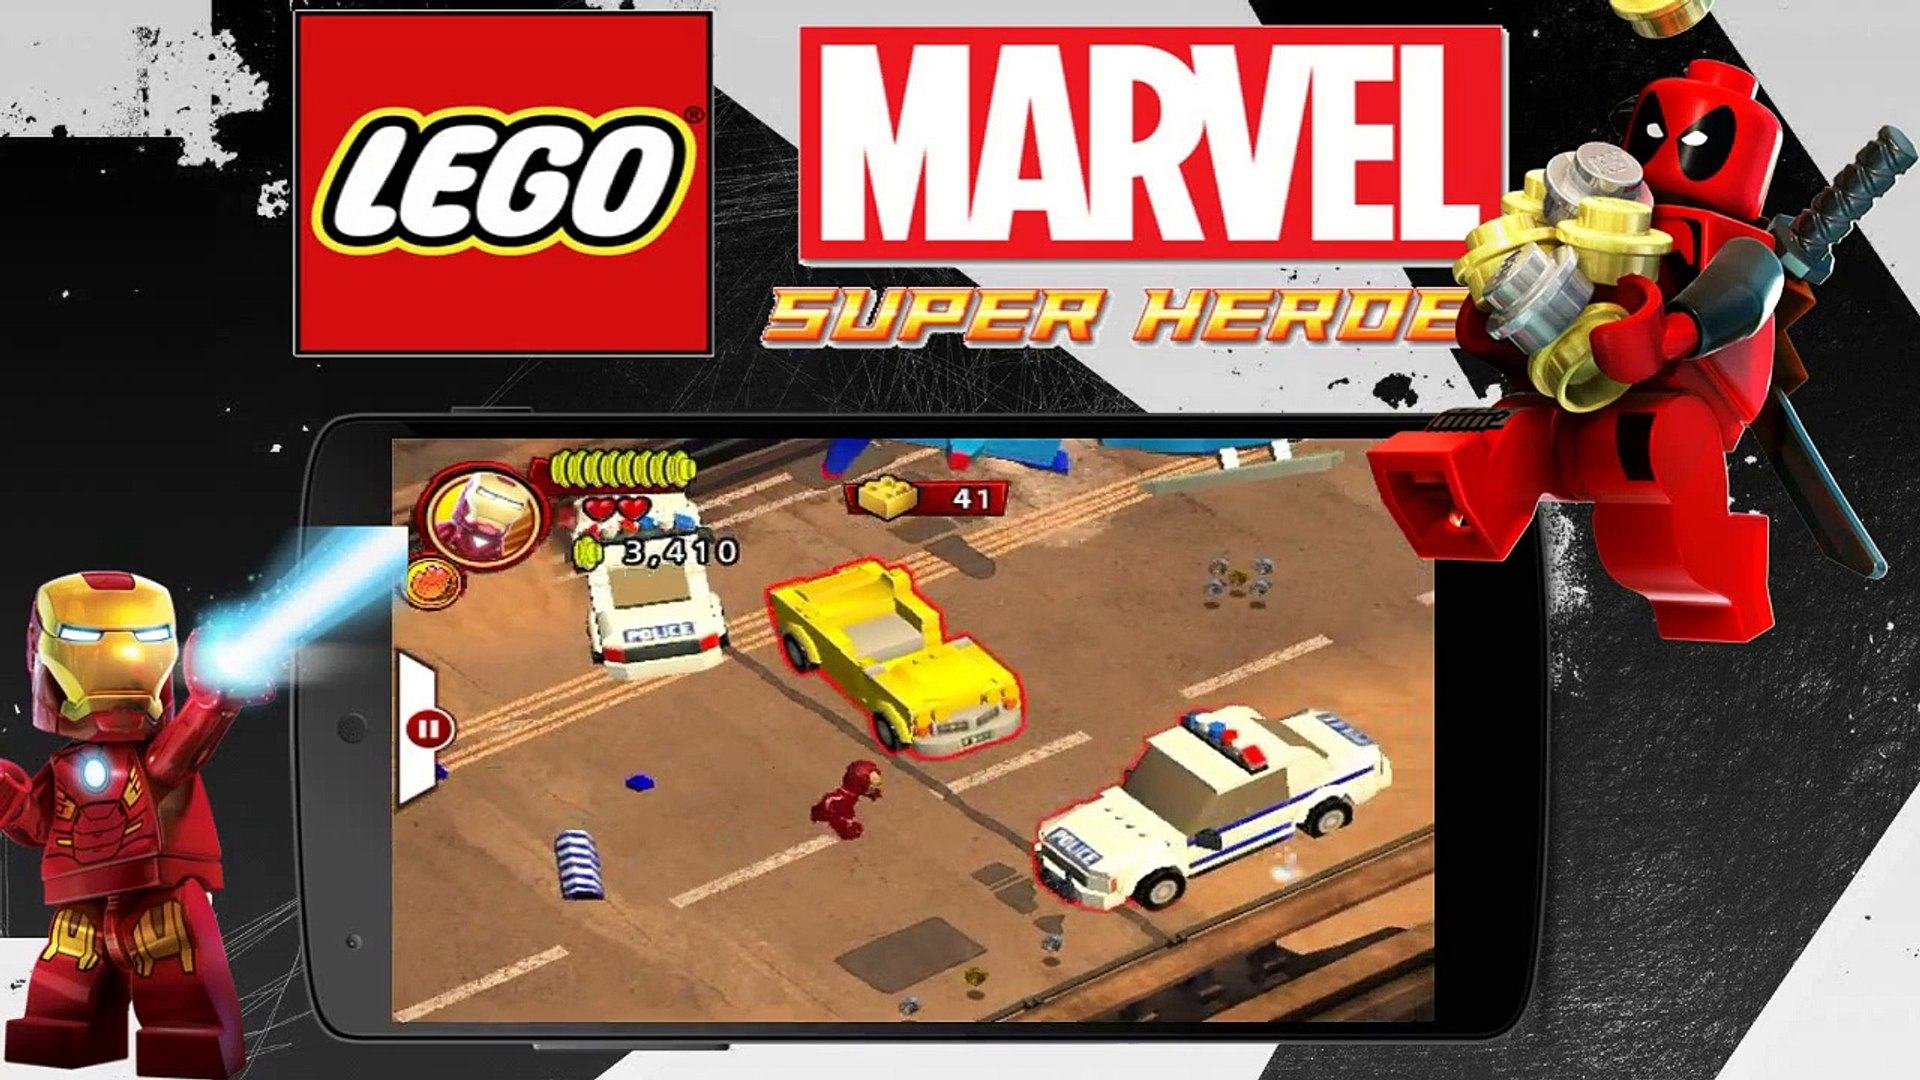 lego marvel super heroes apk mod + data download android